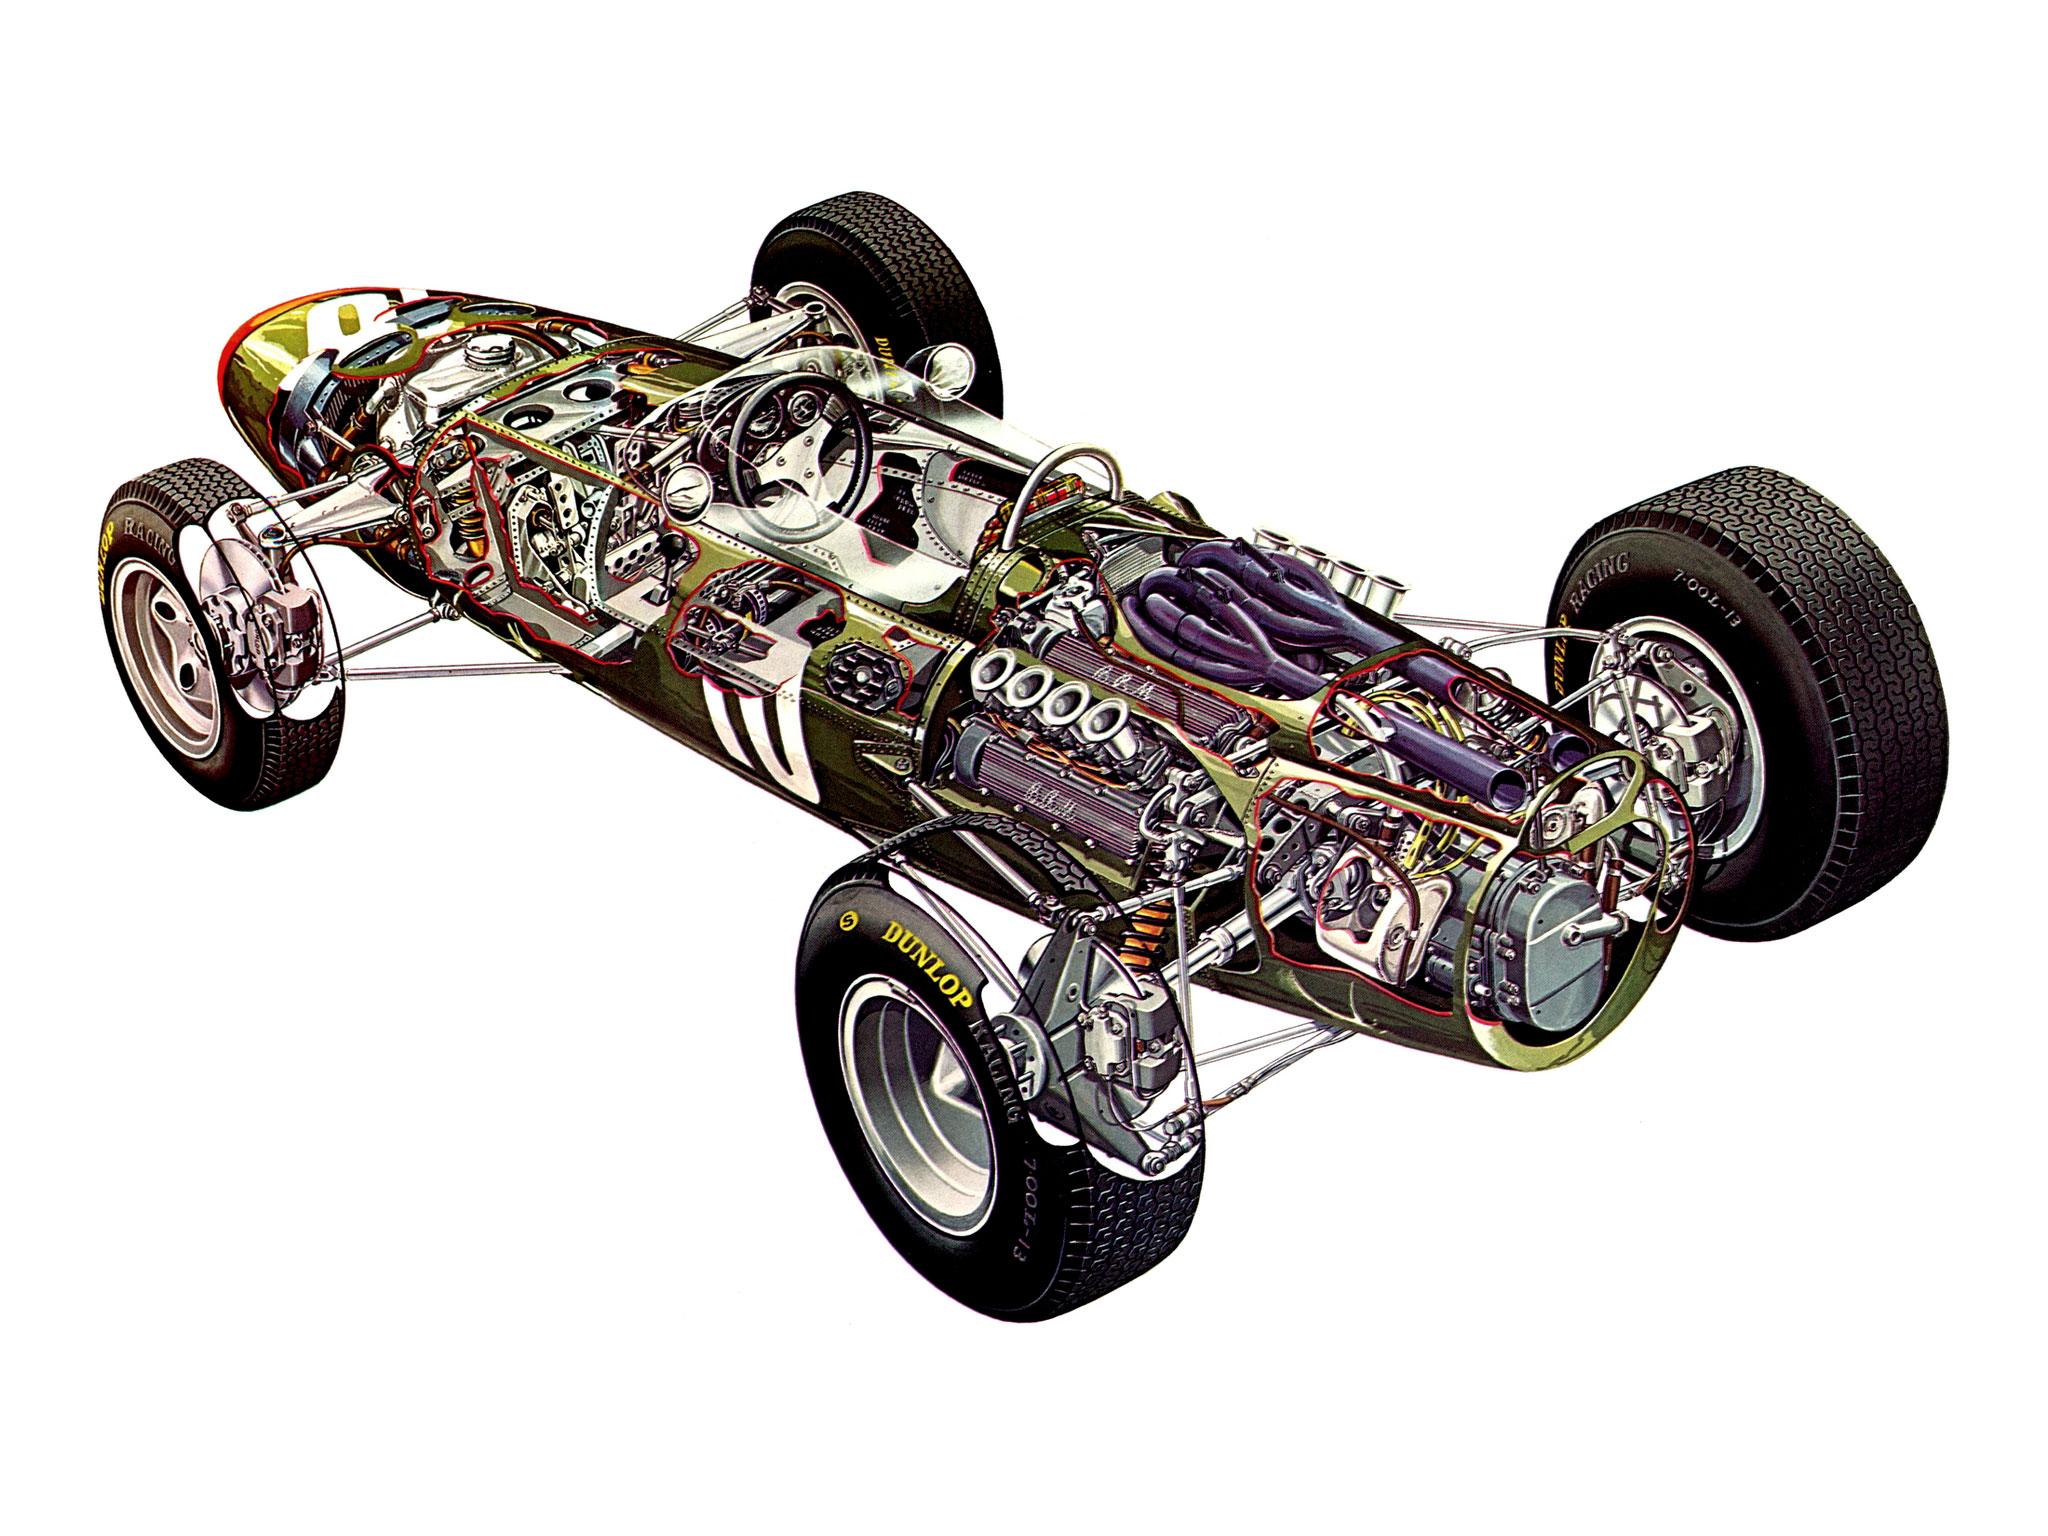 BRM P261 cutaway drawing